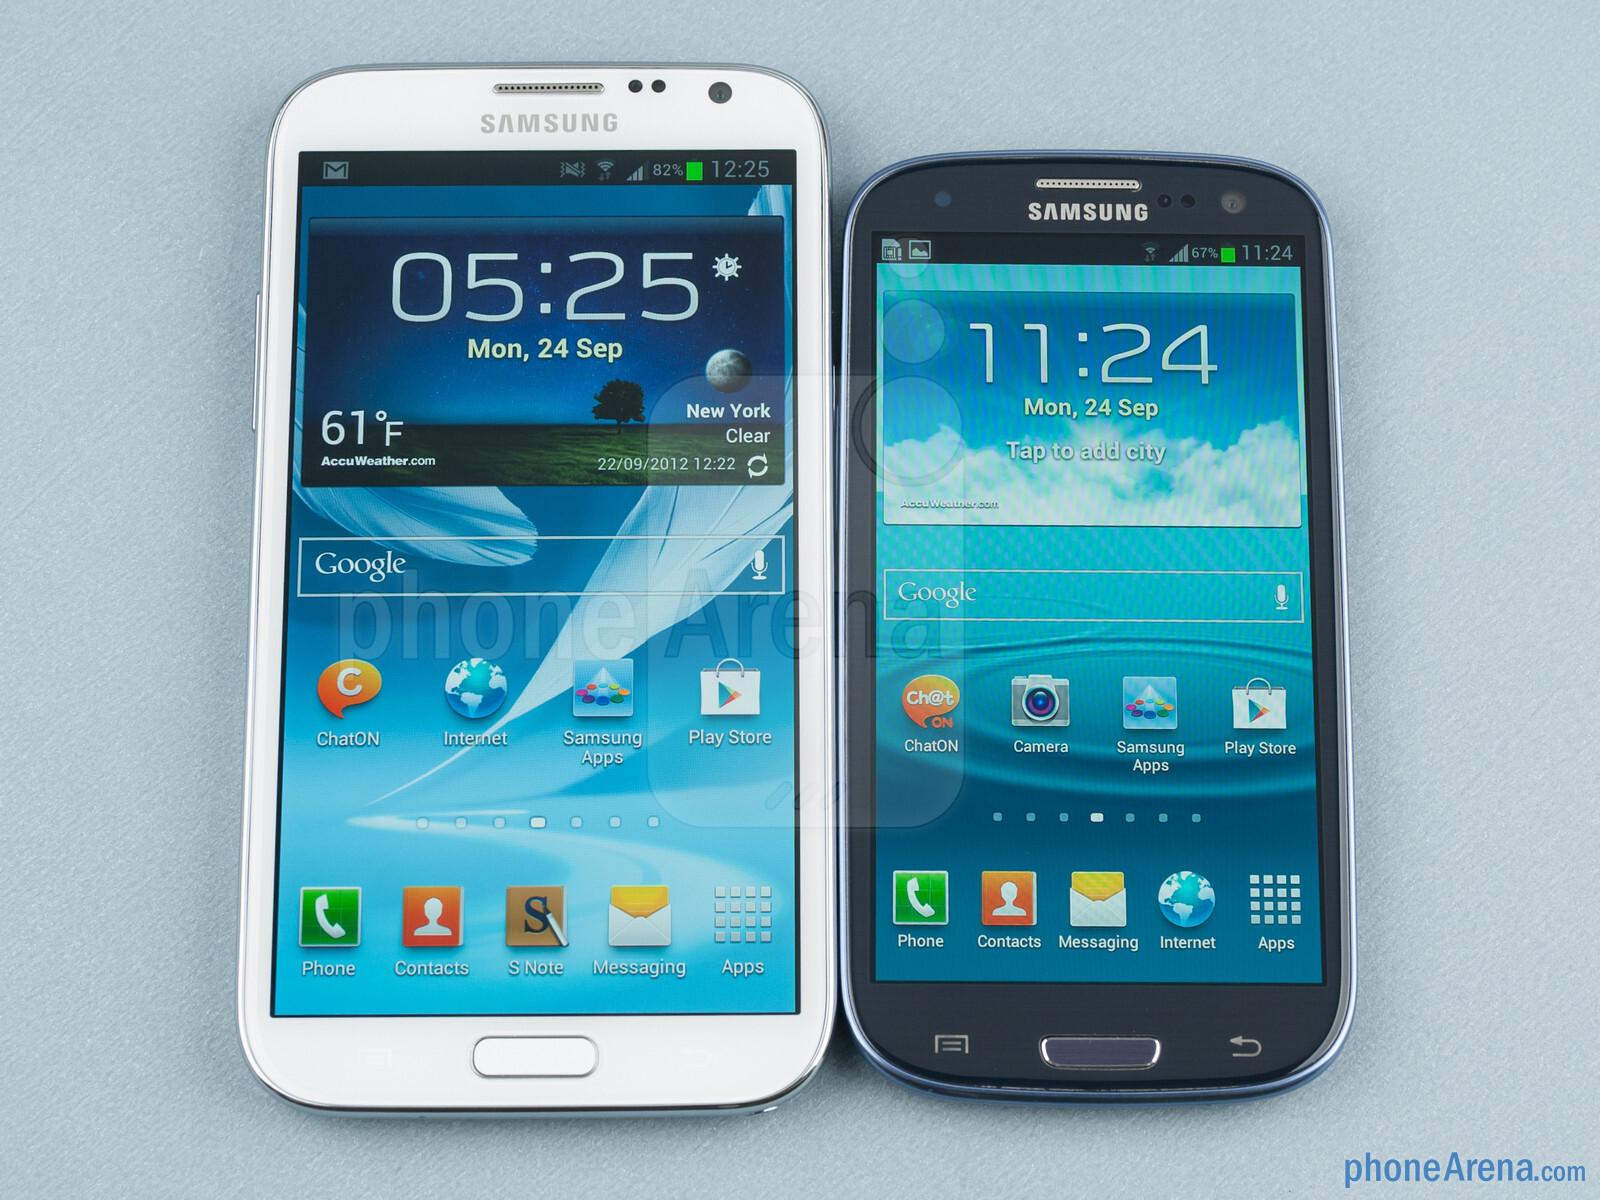 Samsung Galaxy Note II vs Galaxy S III 01 مواصفات ومميزات وعيوب وأسعار جلاكسي نوت 3 Samsung galaxy note